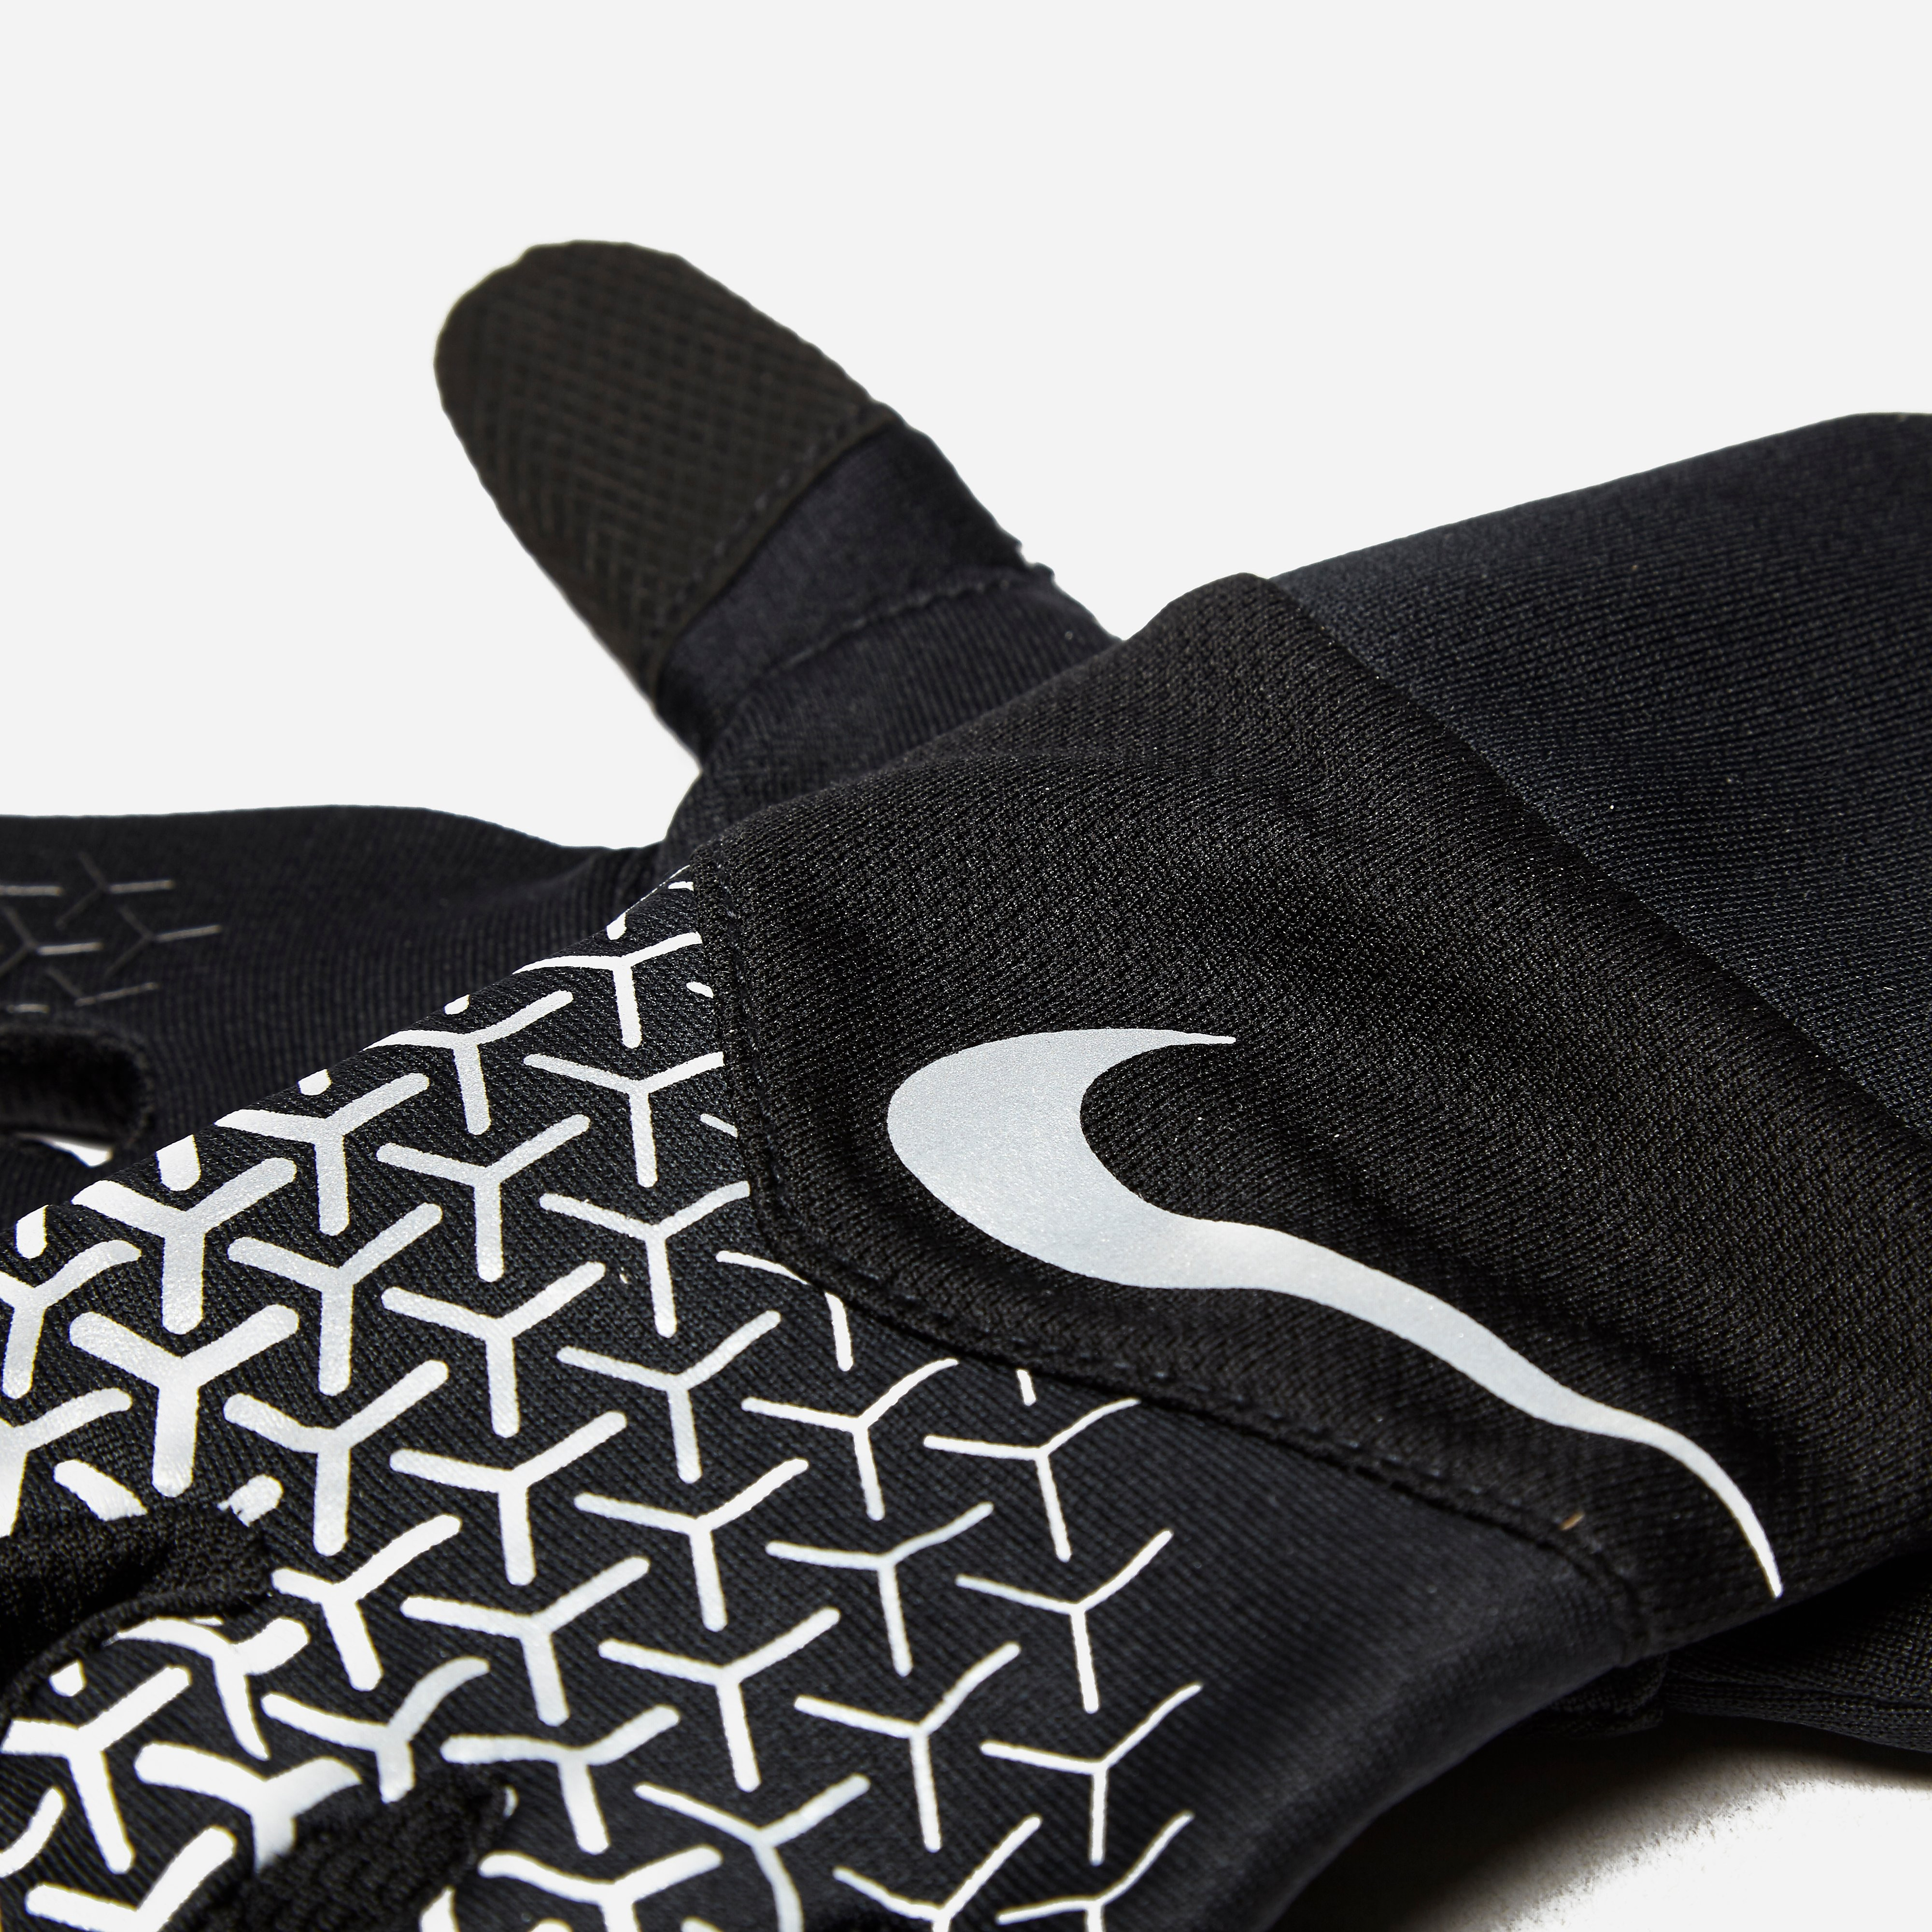 Nike Women's Dri-FIT Tempo 360 Running Gloves